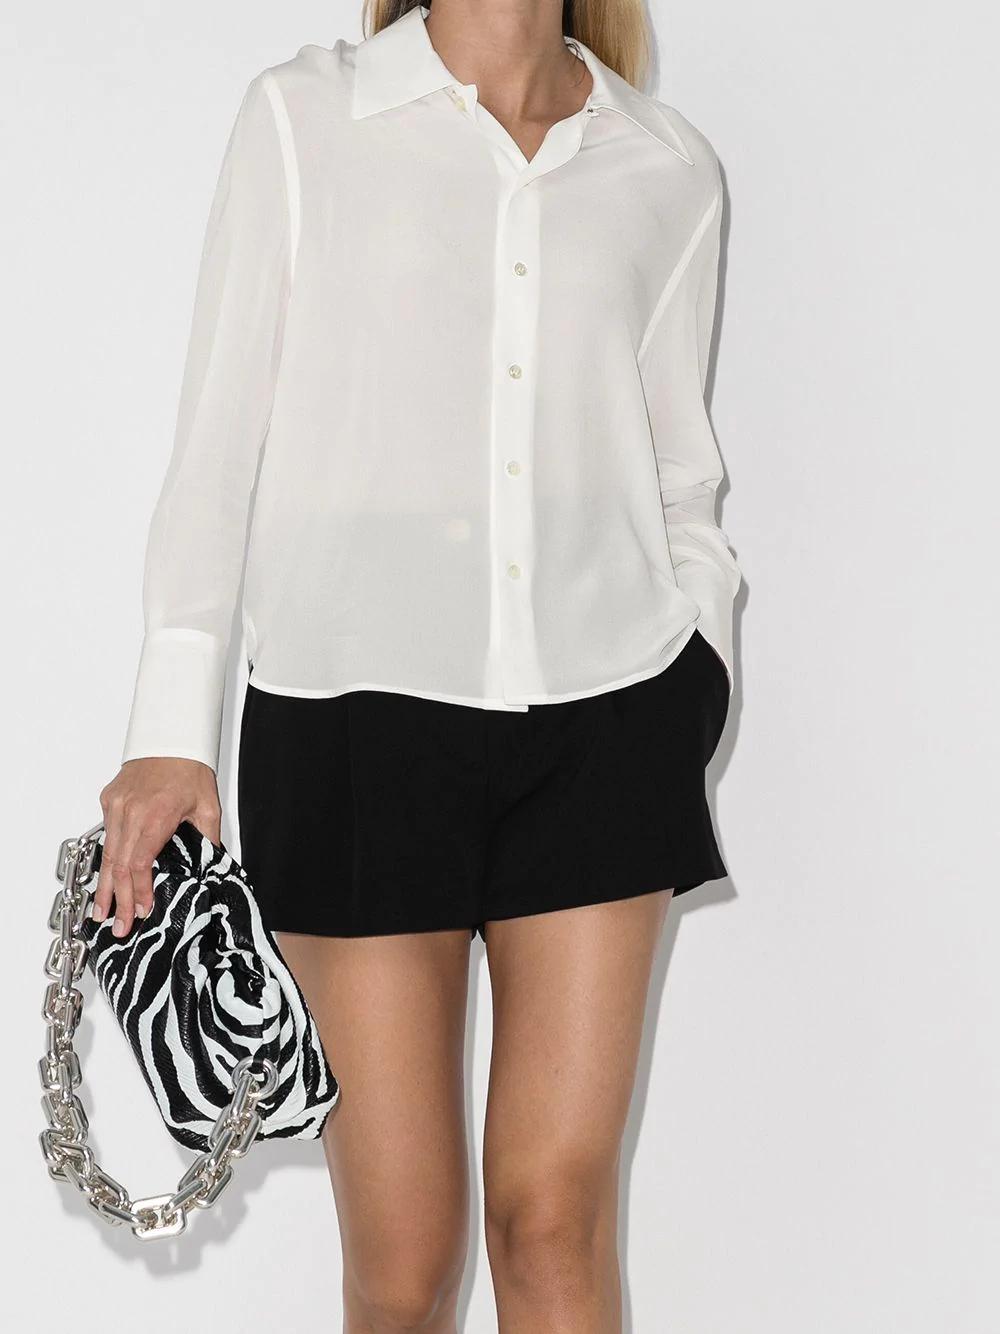 Saint Laurent Silk Shirt 1377лв